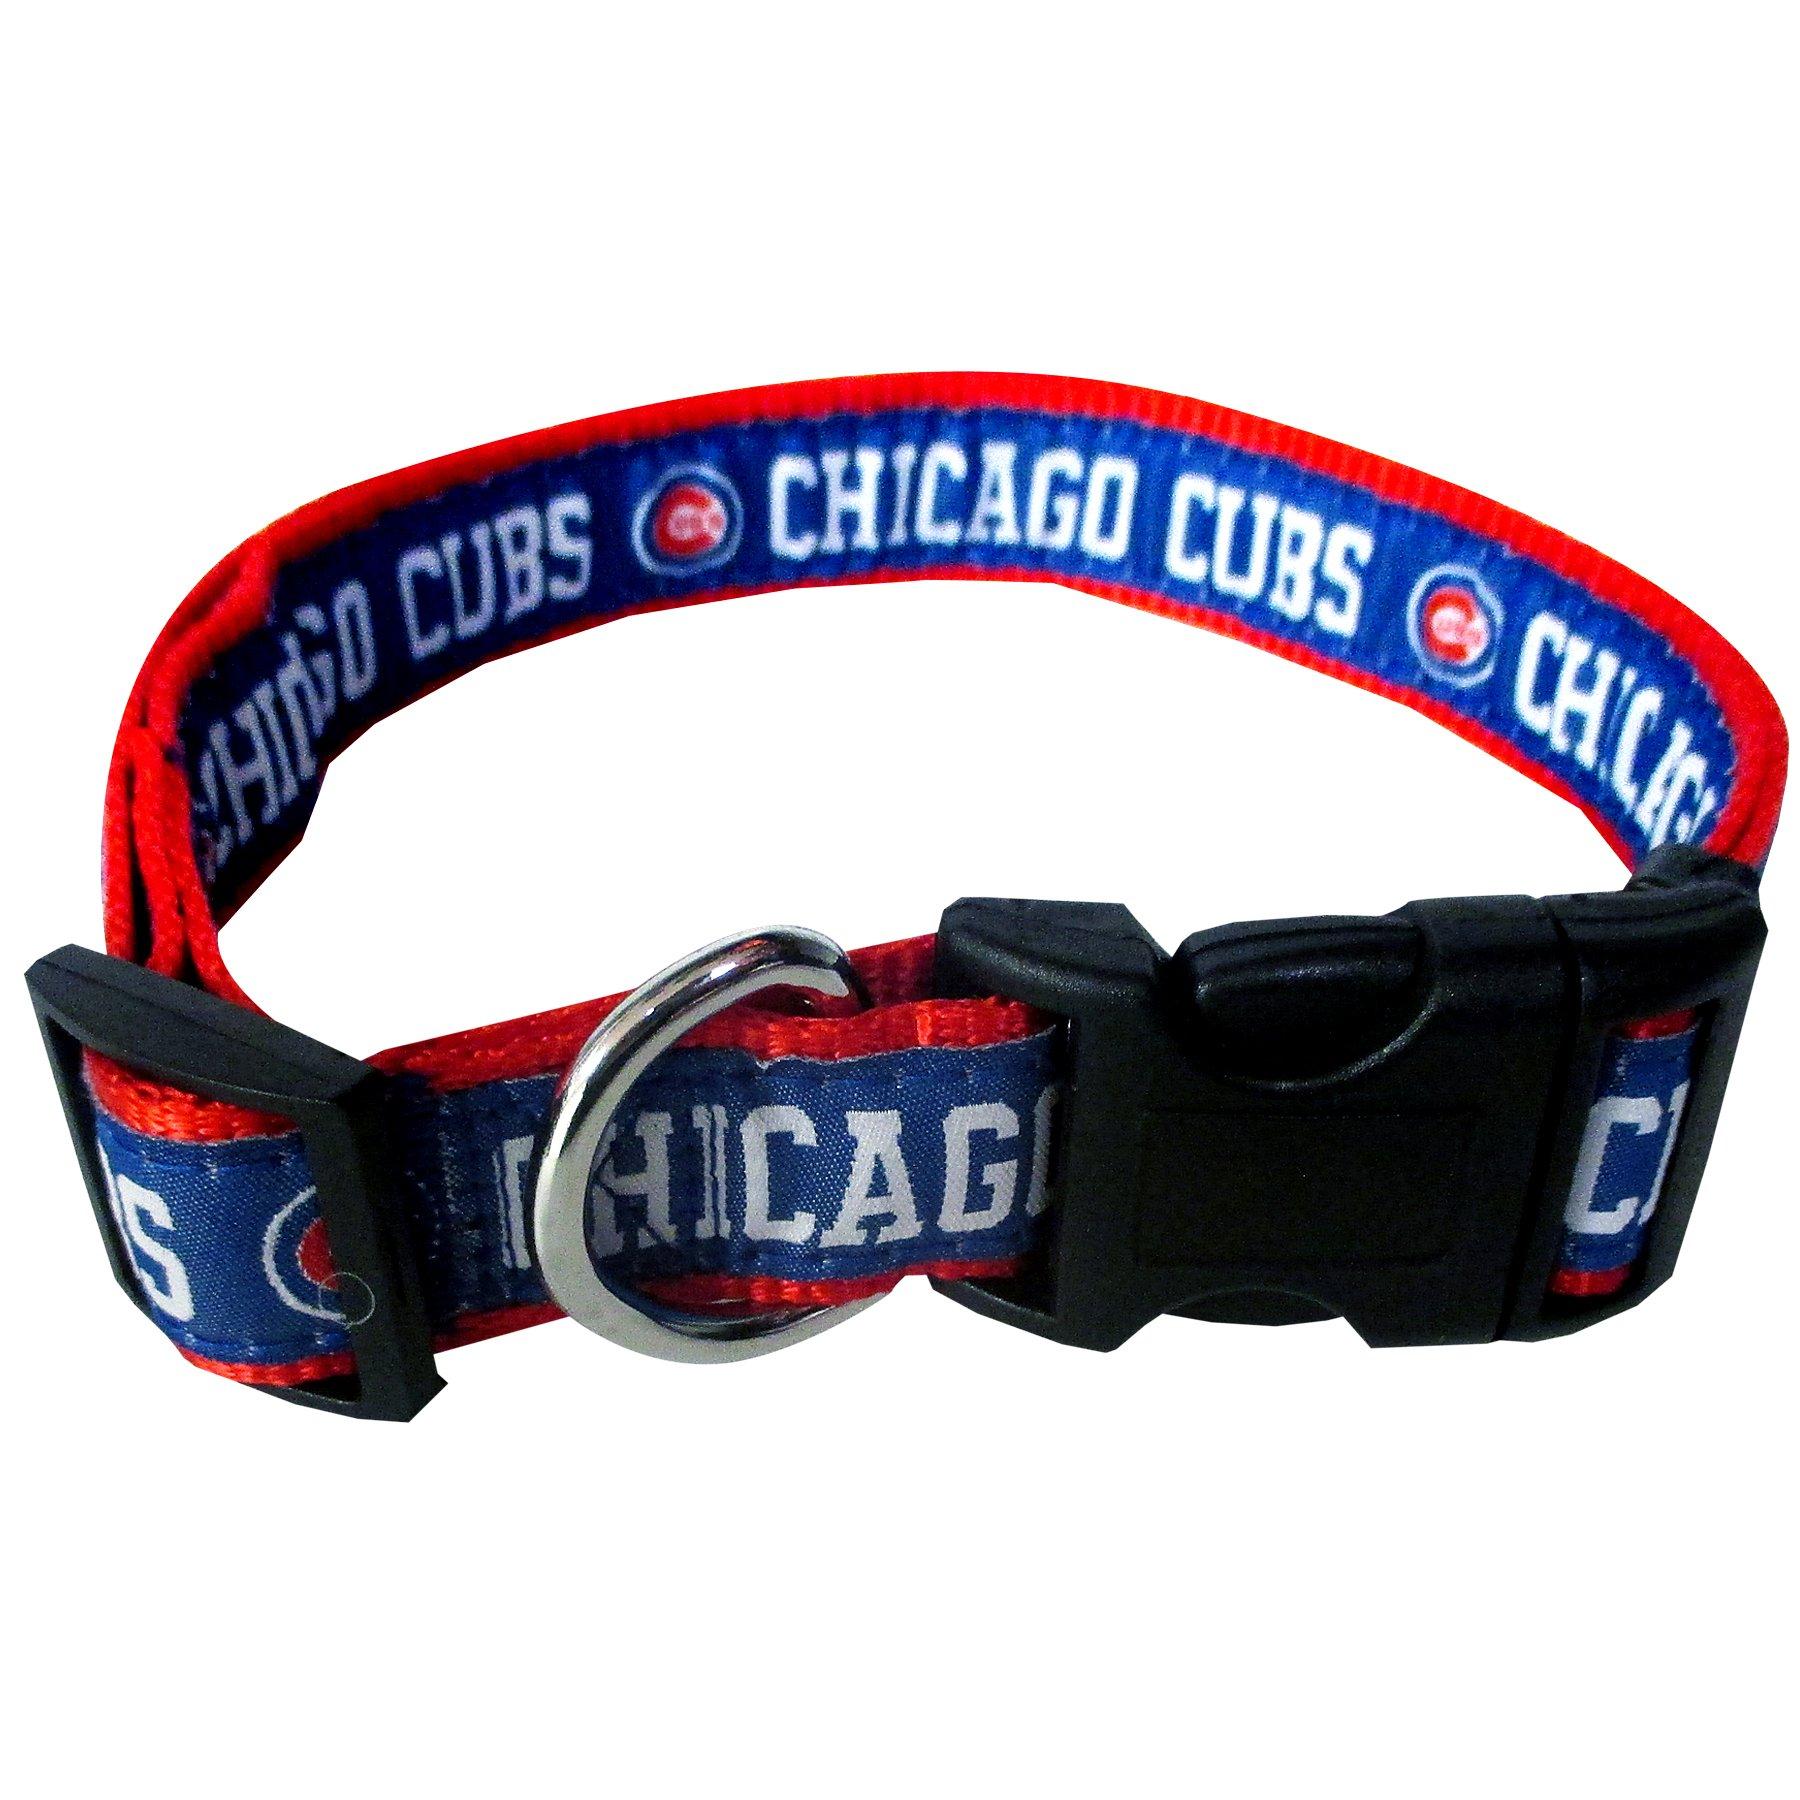 MLB CHICAGO CUBS Dog Collar, Small